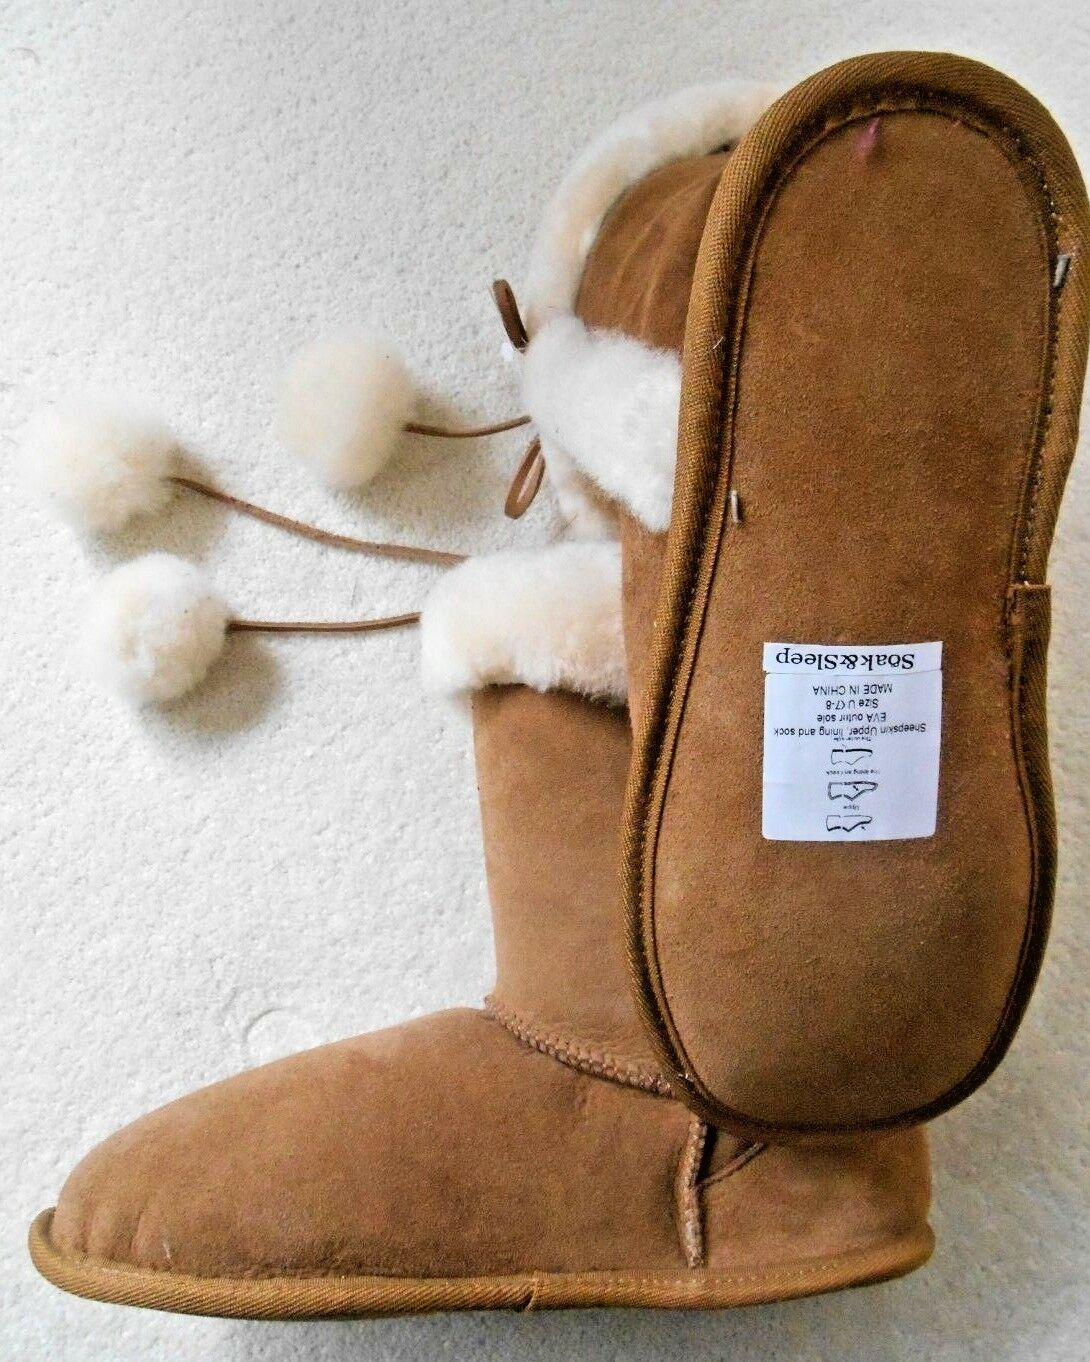 Botín de de piel de piel de de oveja remojo & Sleep tamaño 7-8 df7985